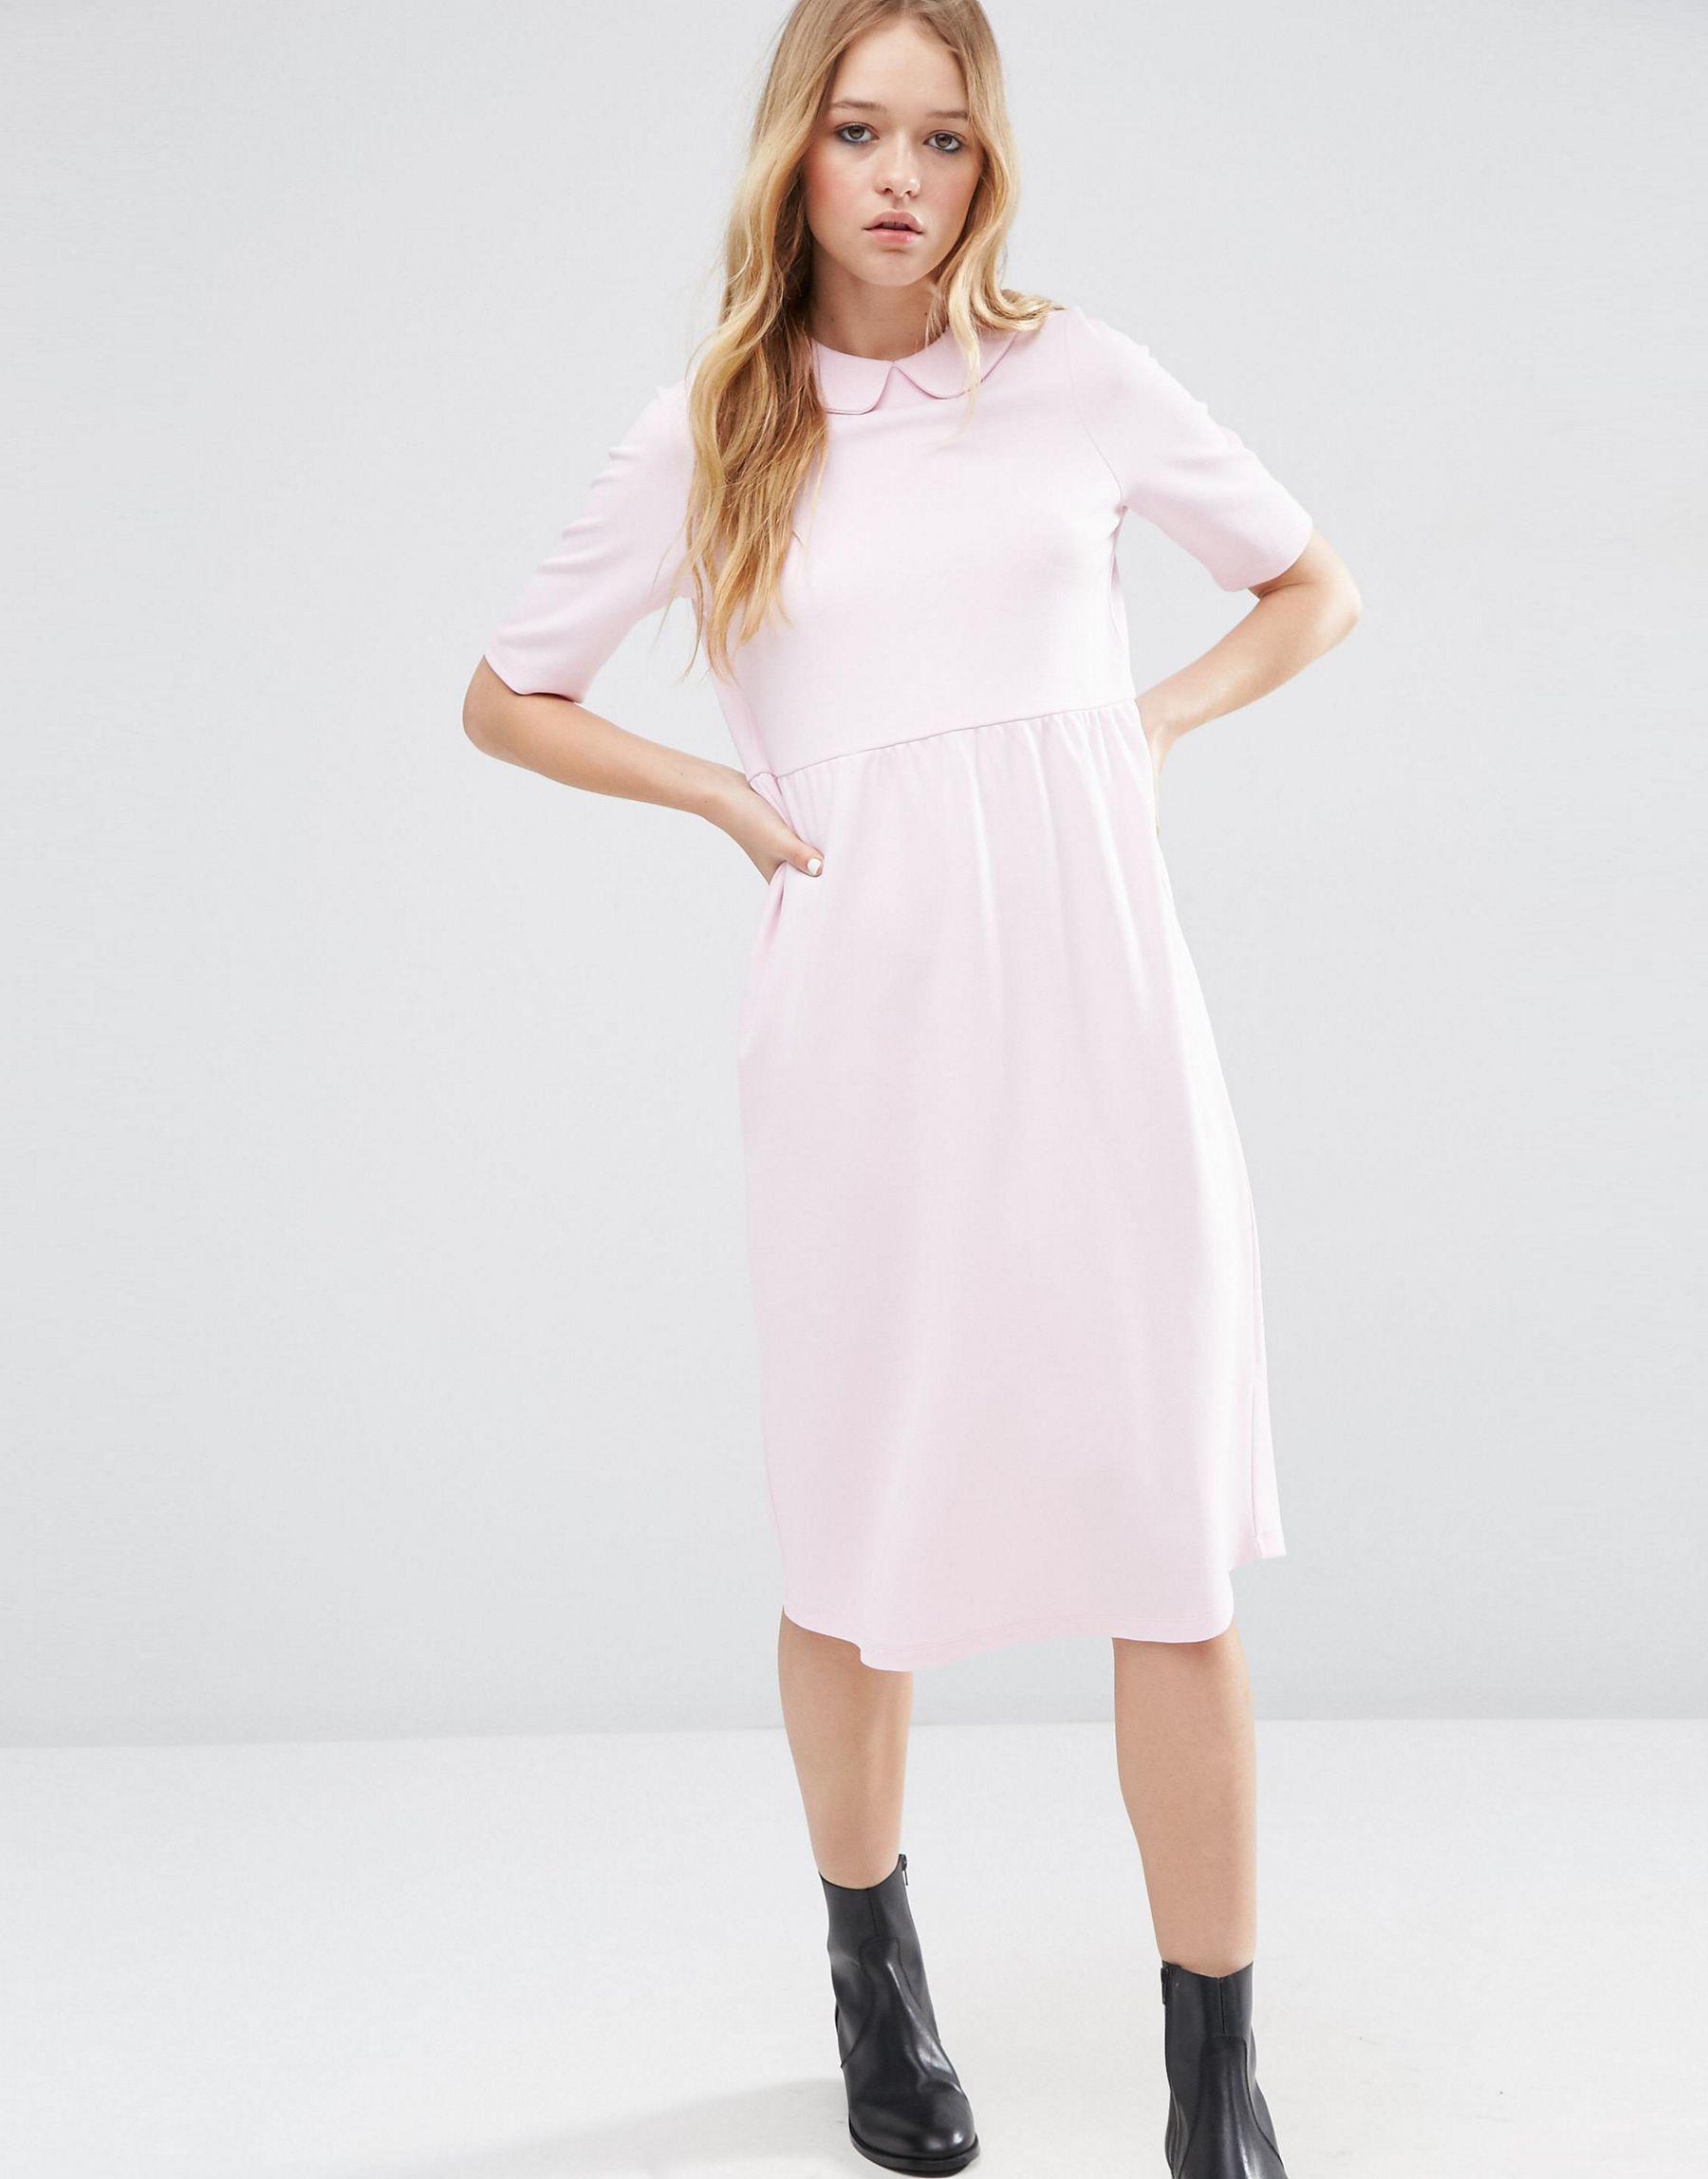 Asos Synthetic Peter Pan Collar Smock Structured Dress